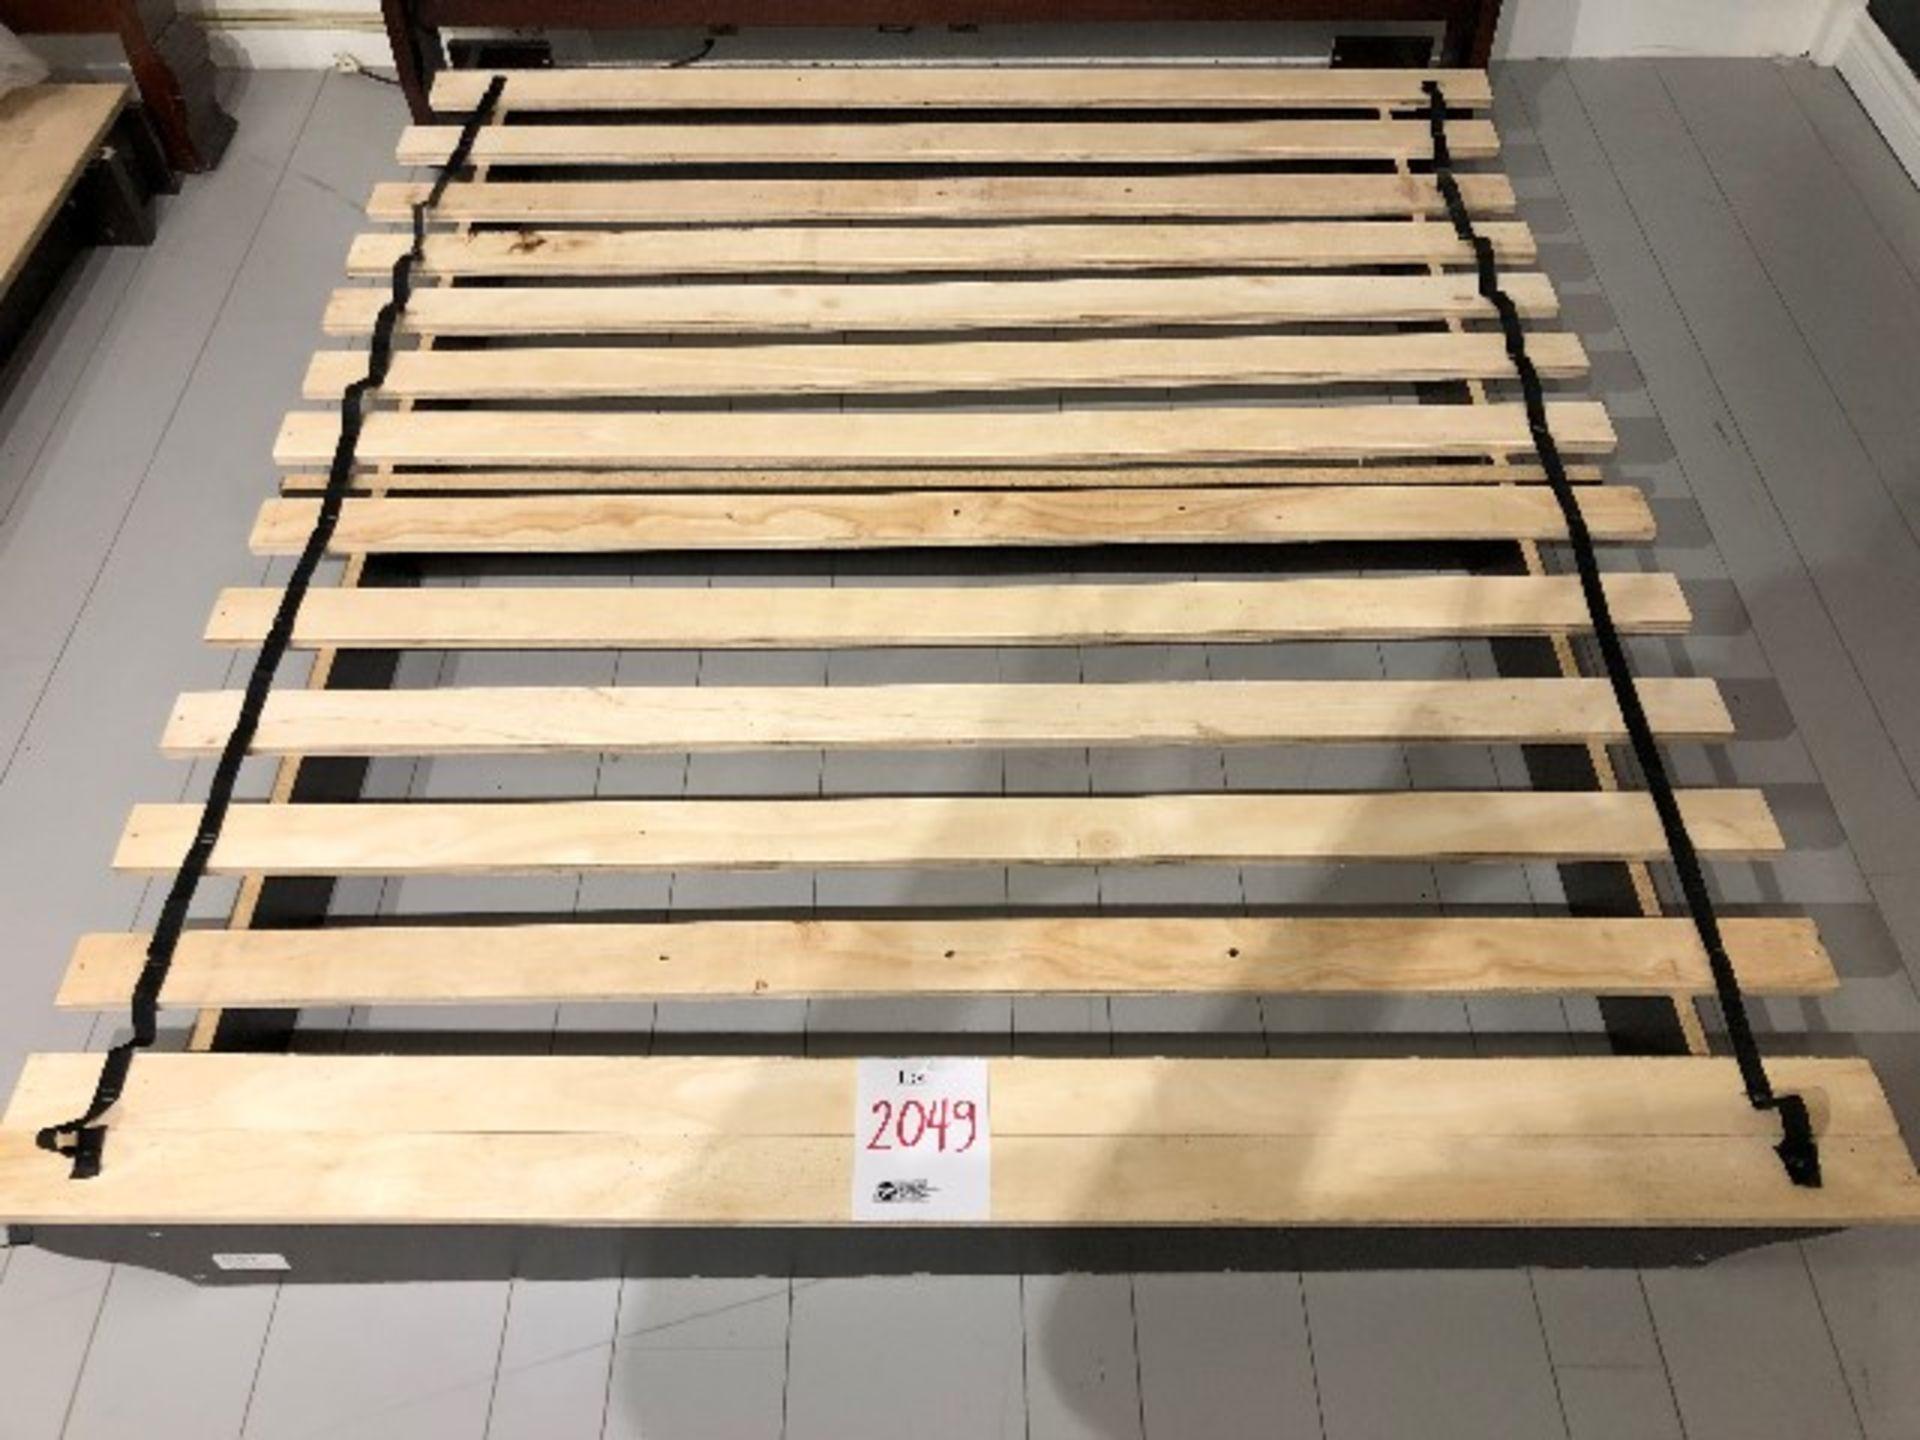 Lot 2049 - Pedestal support w/slats